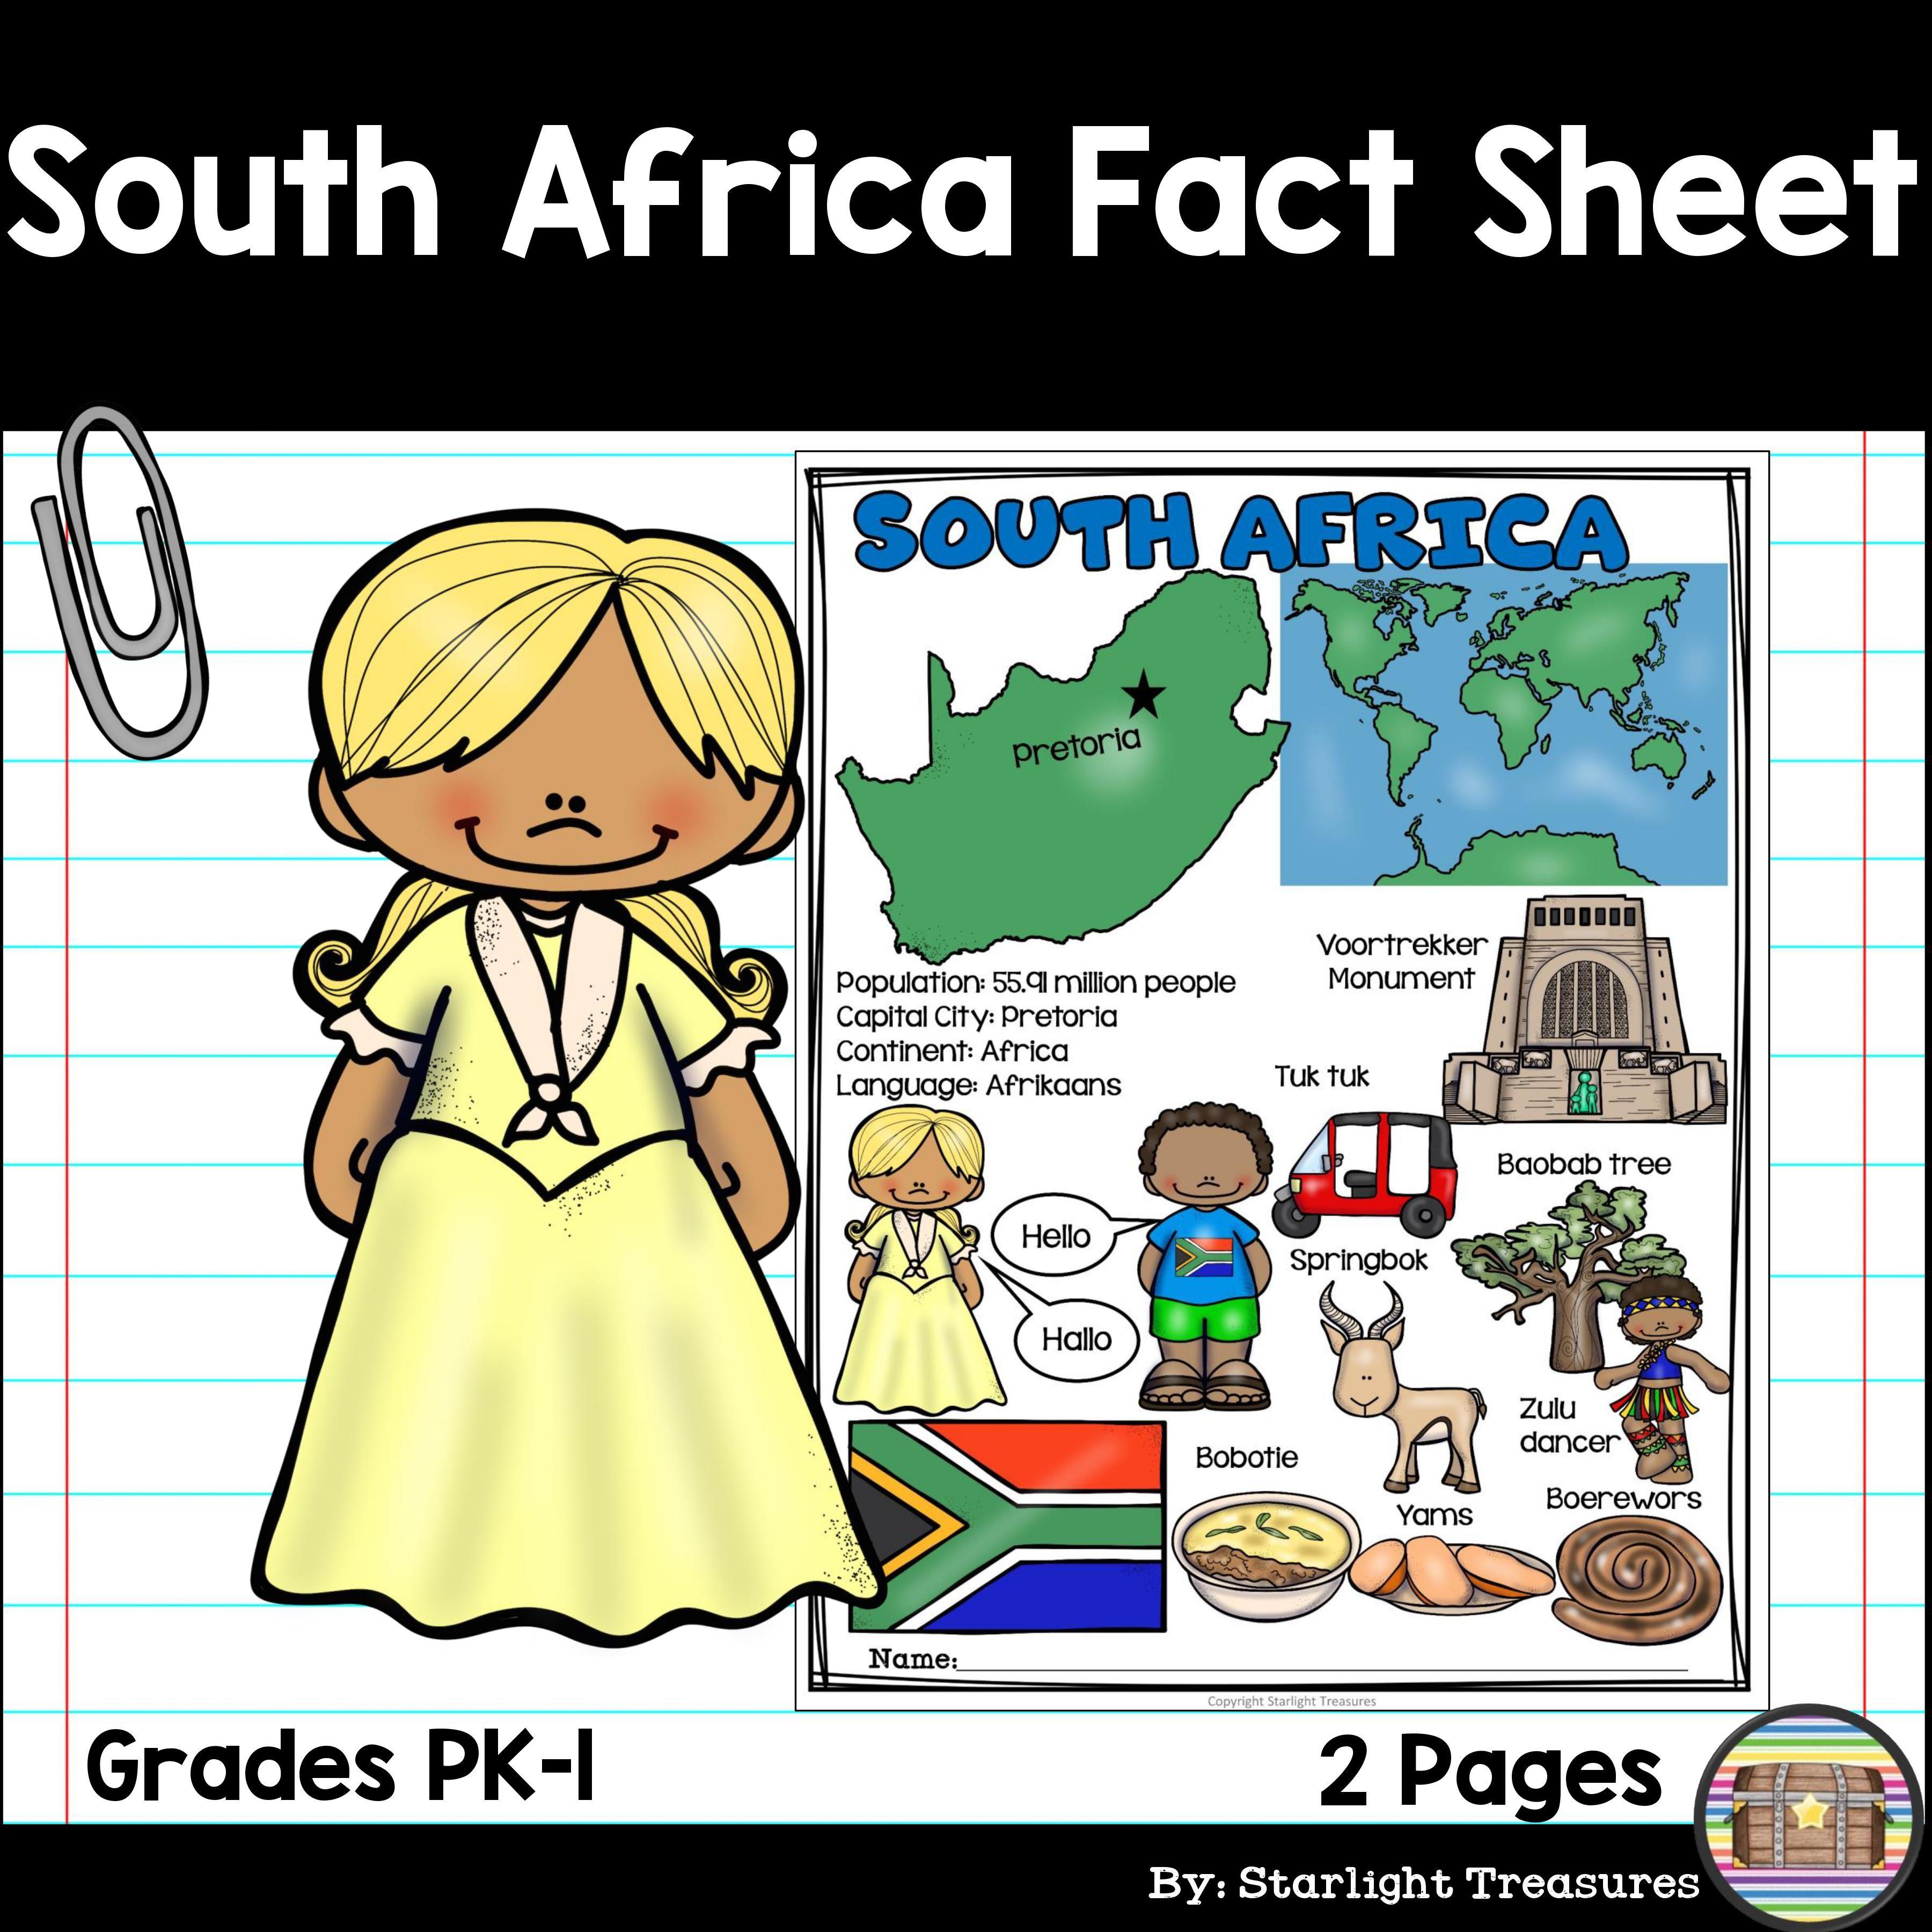 South Africa Fact Sheet